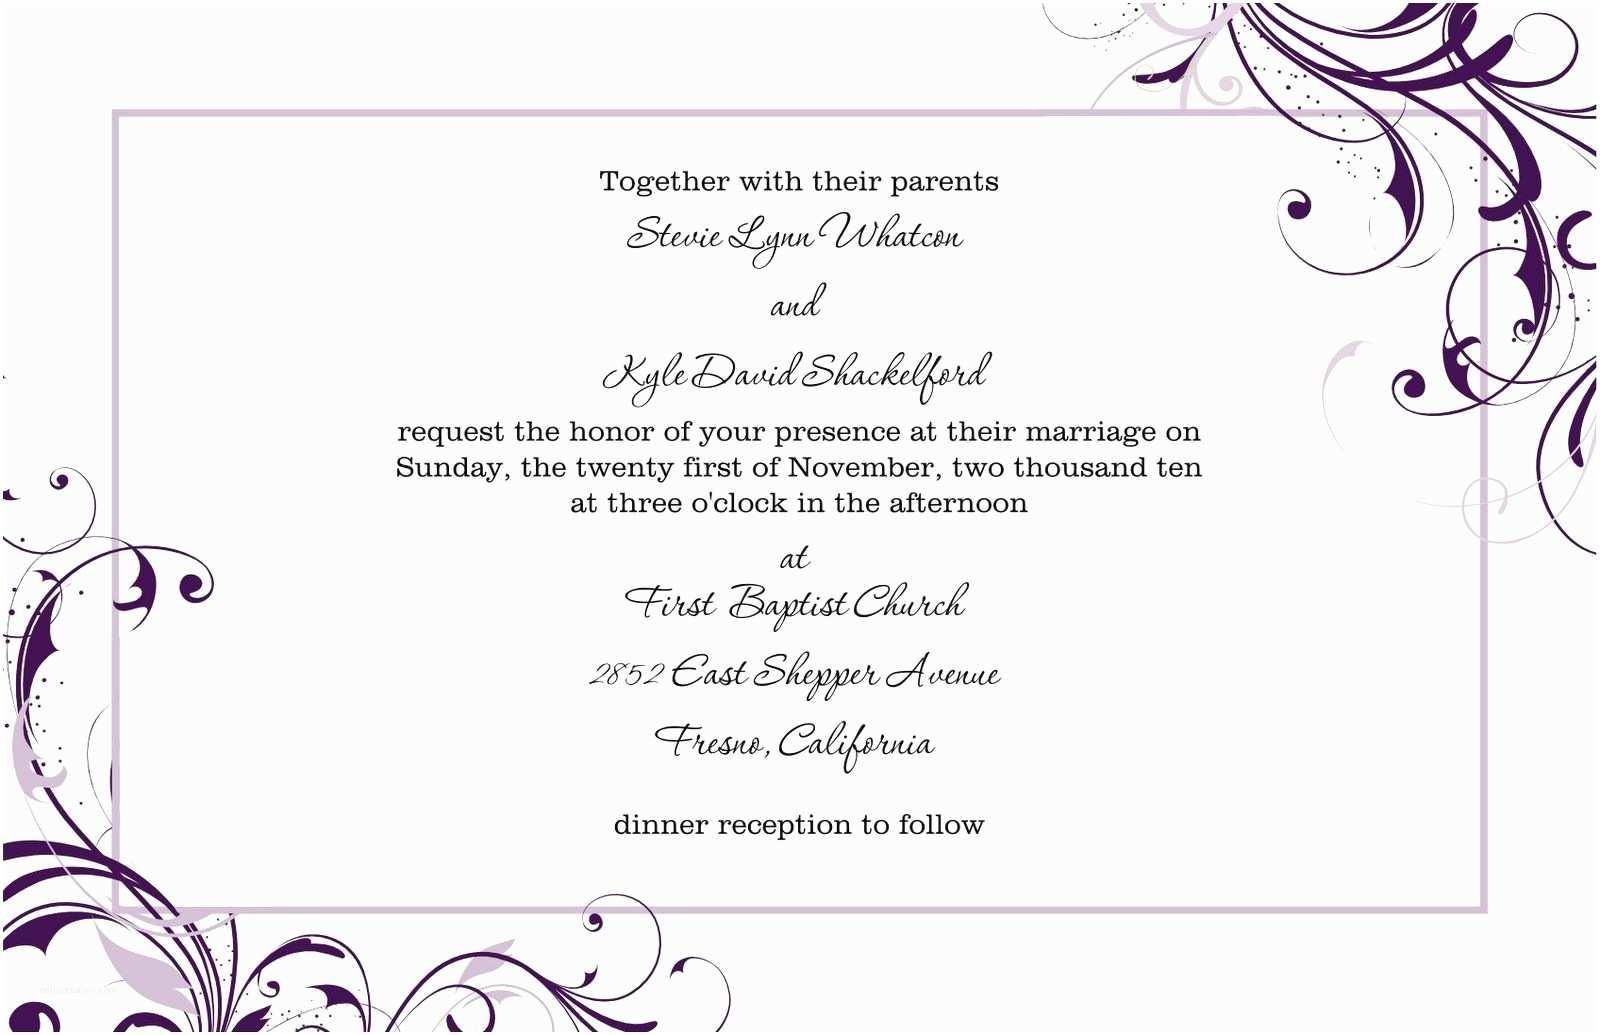 Free Printable Wedding Invitation Templates for Word Free Blank Wedding Invitation Templates for Microsoft Word